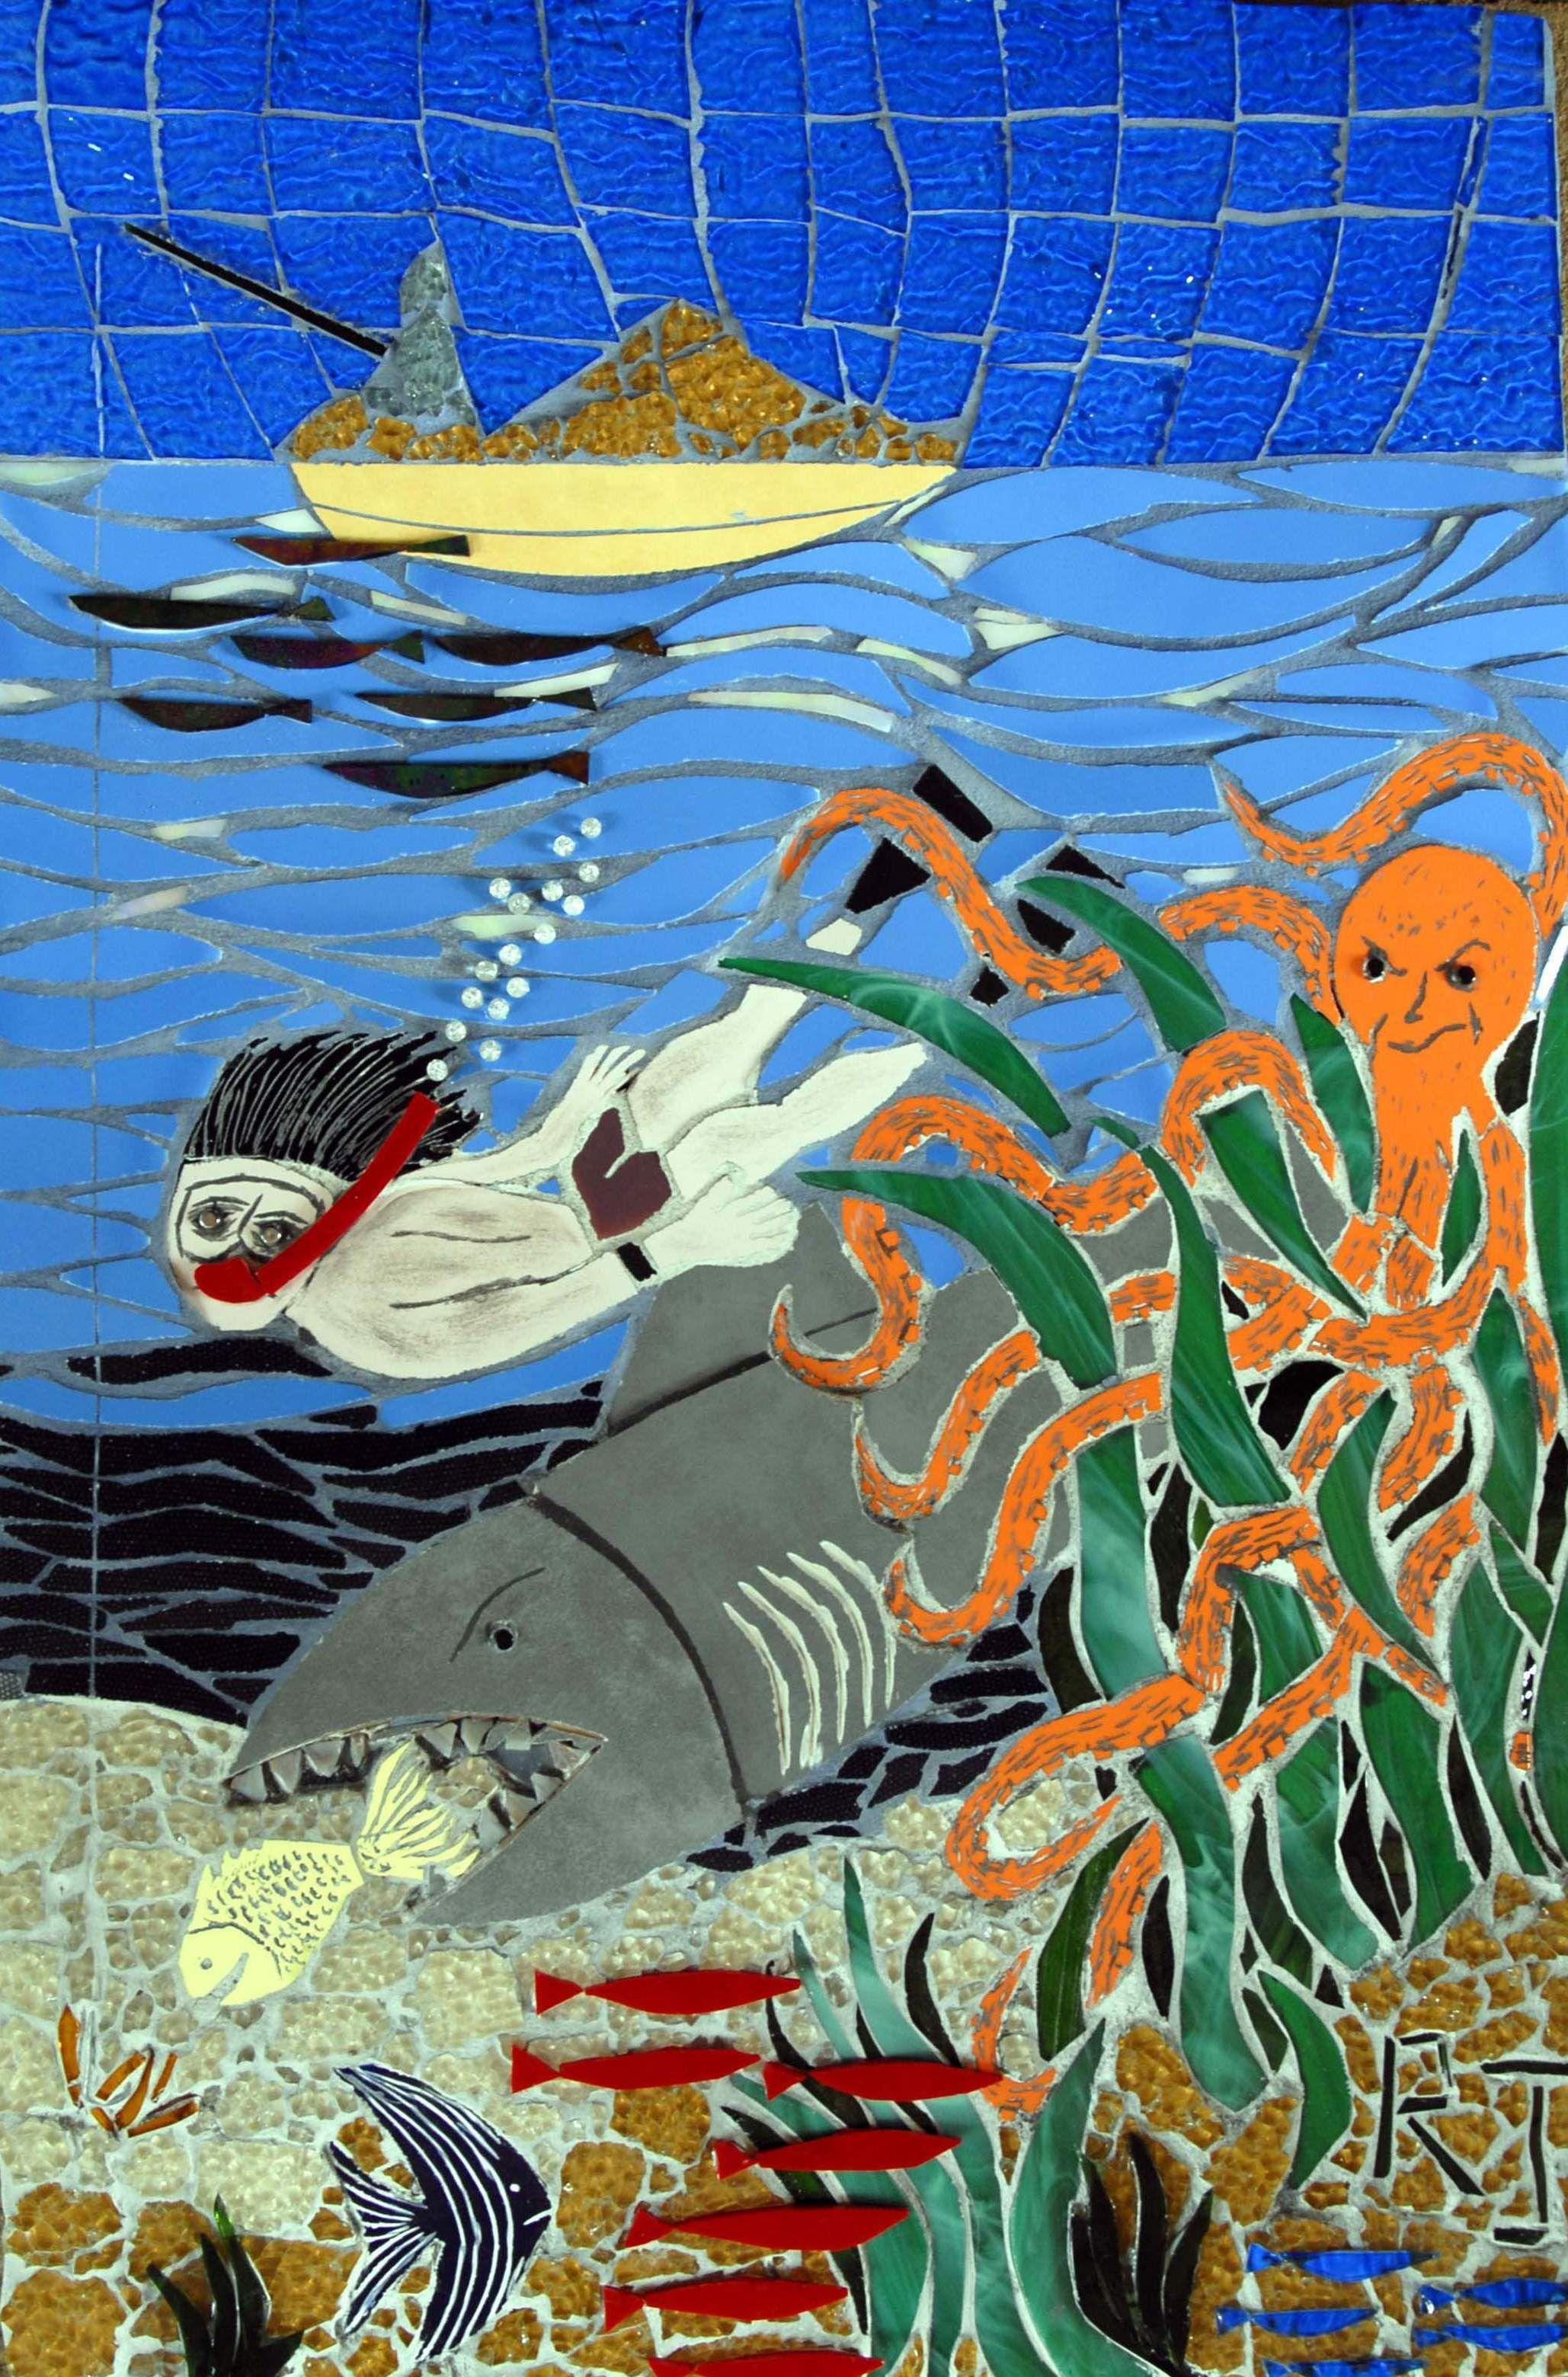 The barrier reef 75 cm x 50 cm mosaic art wall hanging 75 cm x 50 cm mosaic art wall hanging dailygadgetfo Gallery